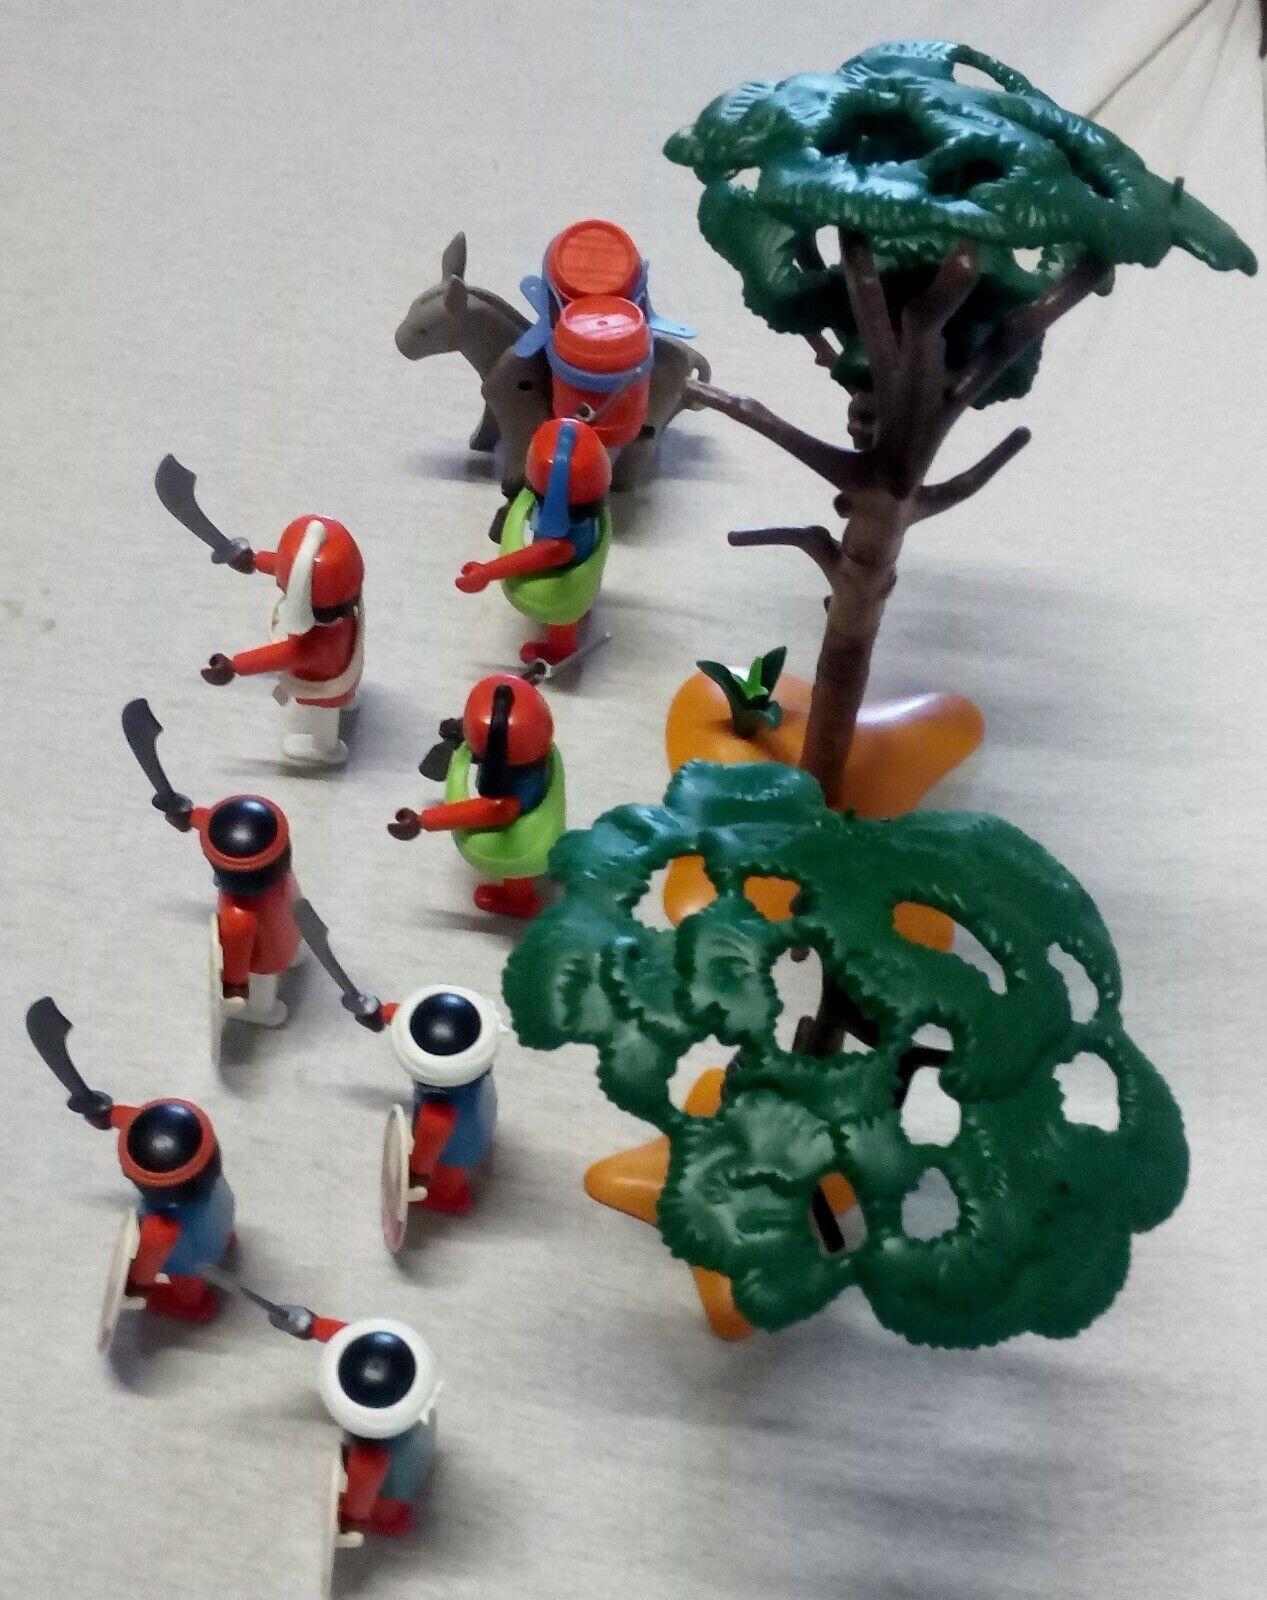 LOT PLAYMOBIL PLAYMOBIL PLAYMOBIL ARMEE INDIGENE- RARES- VEGETATION 000bbd